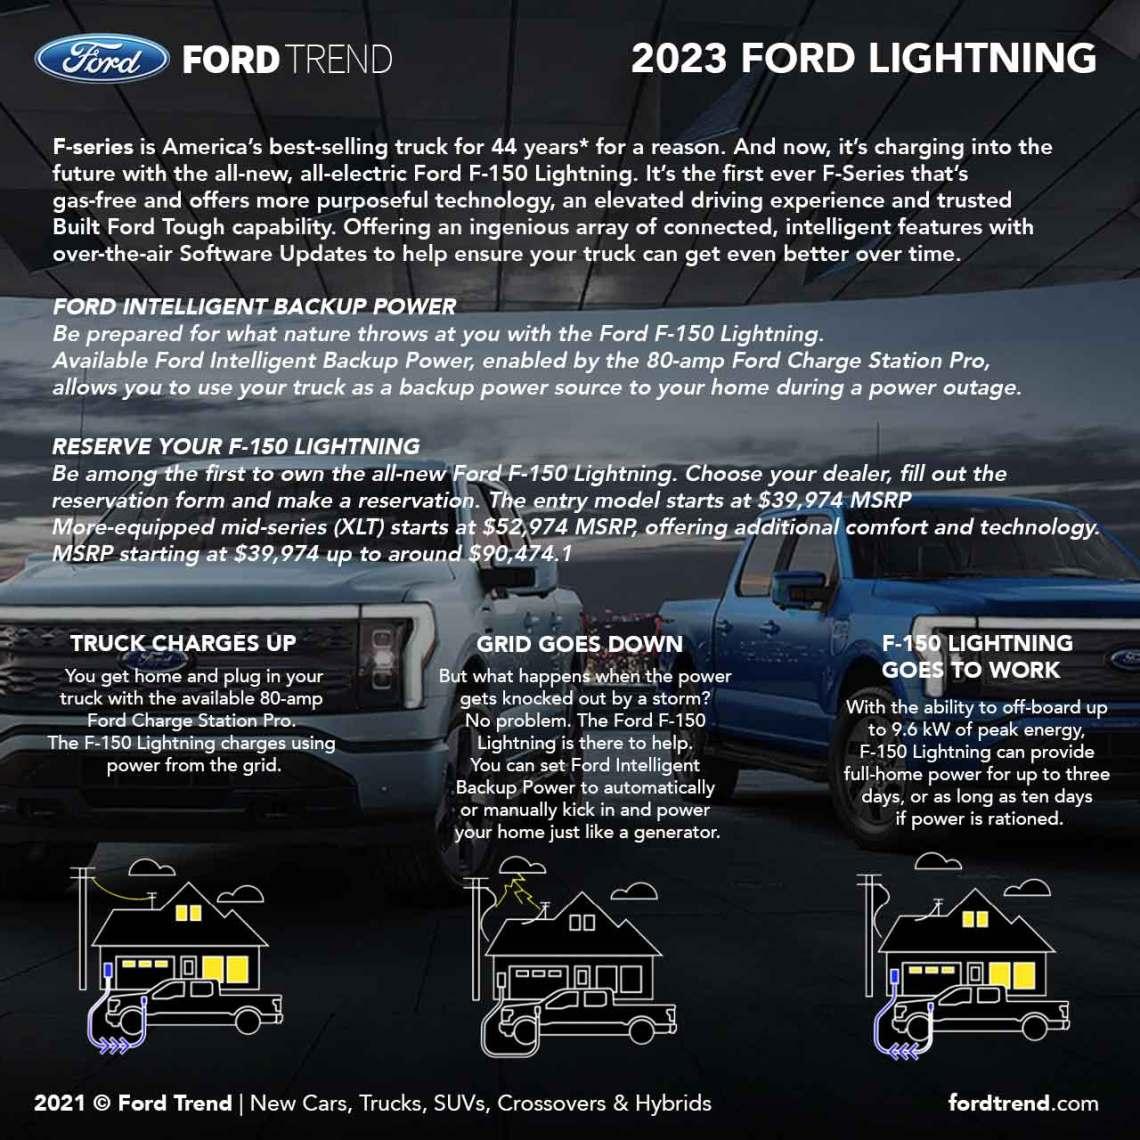 2023 Ford Lightning